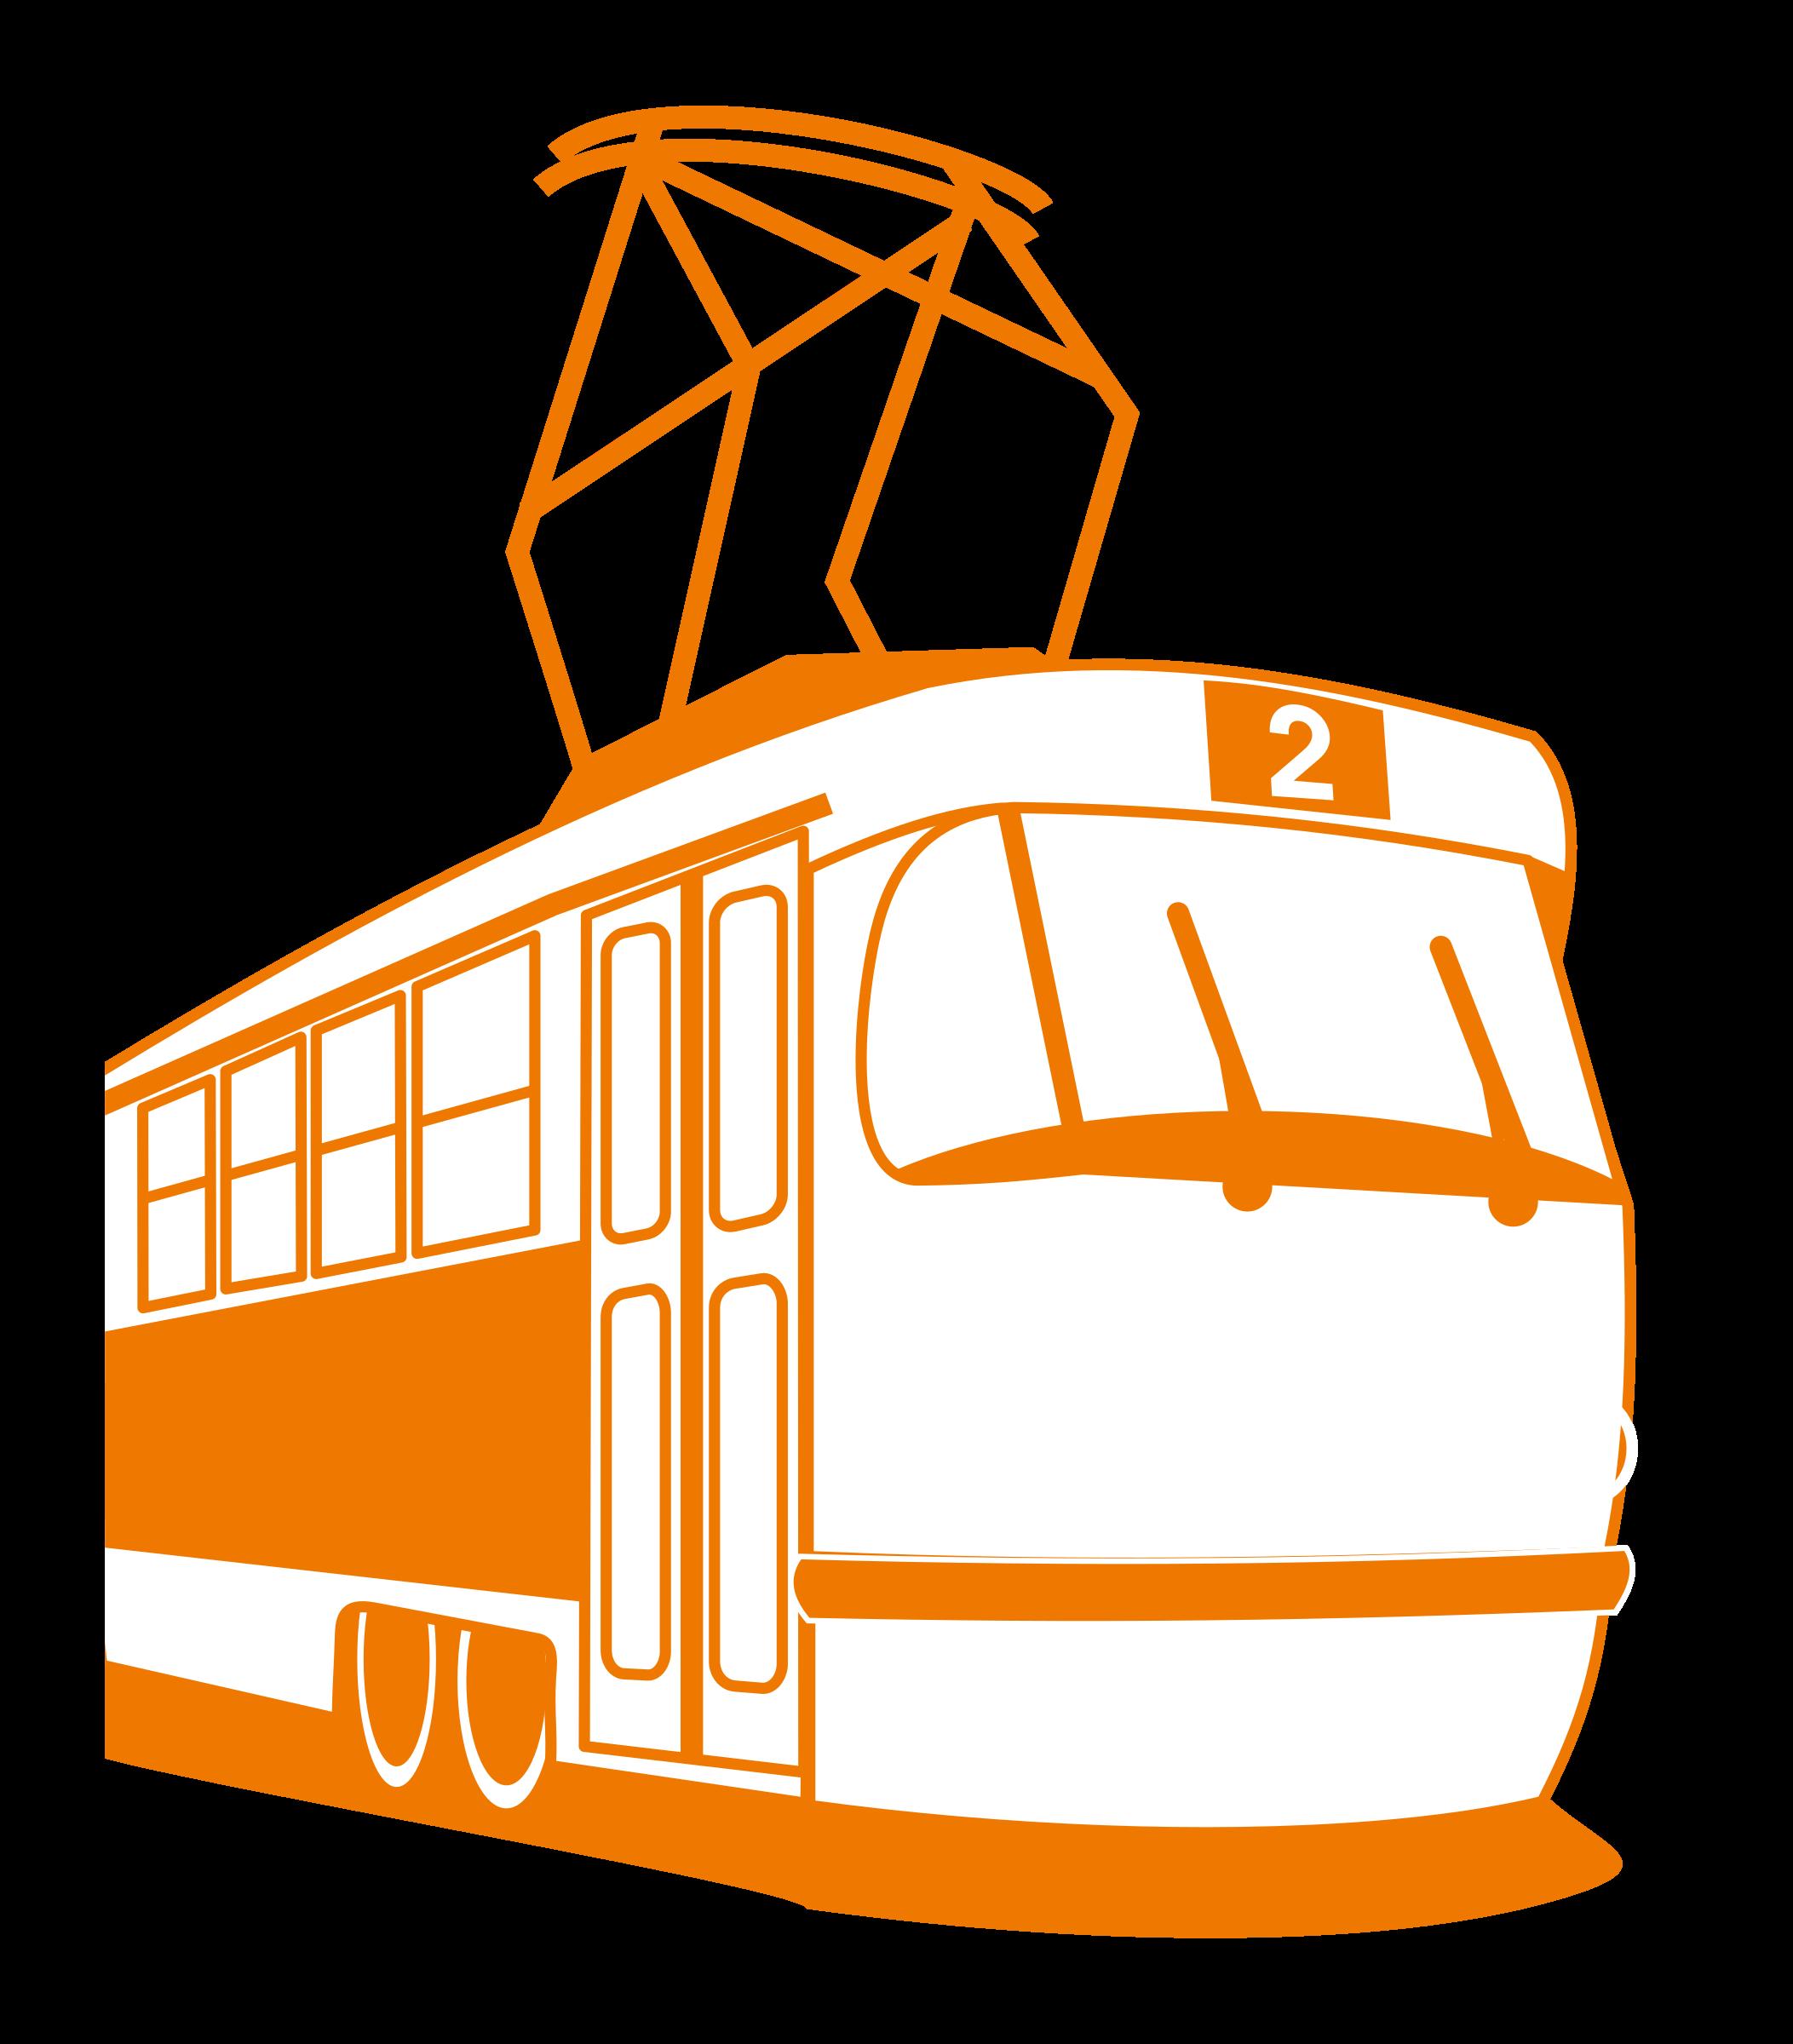 Tramway big image png. Transportation clipart urban transport